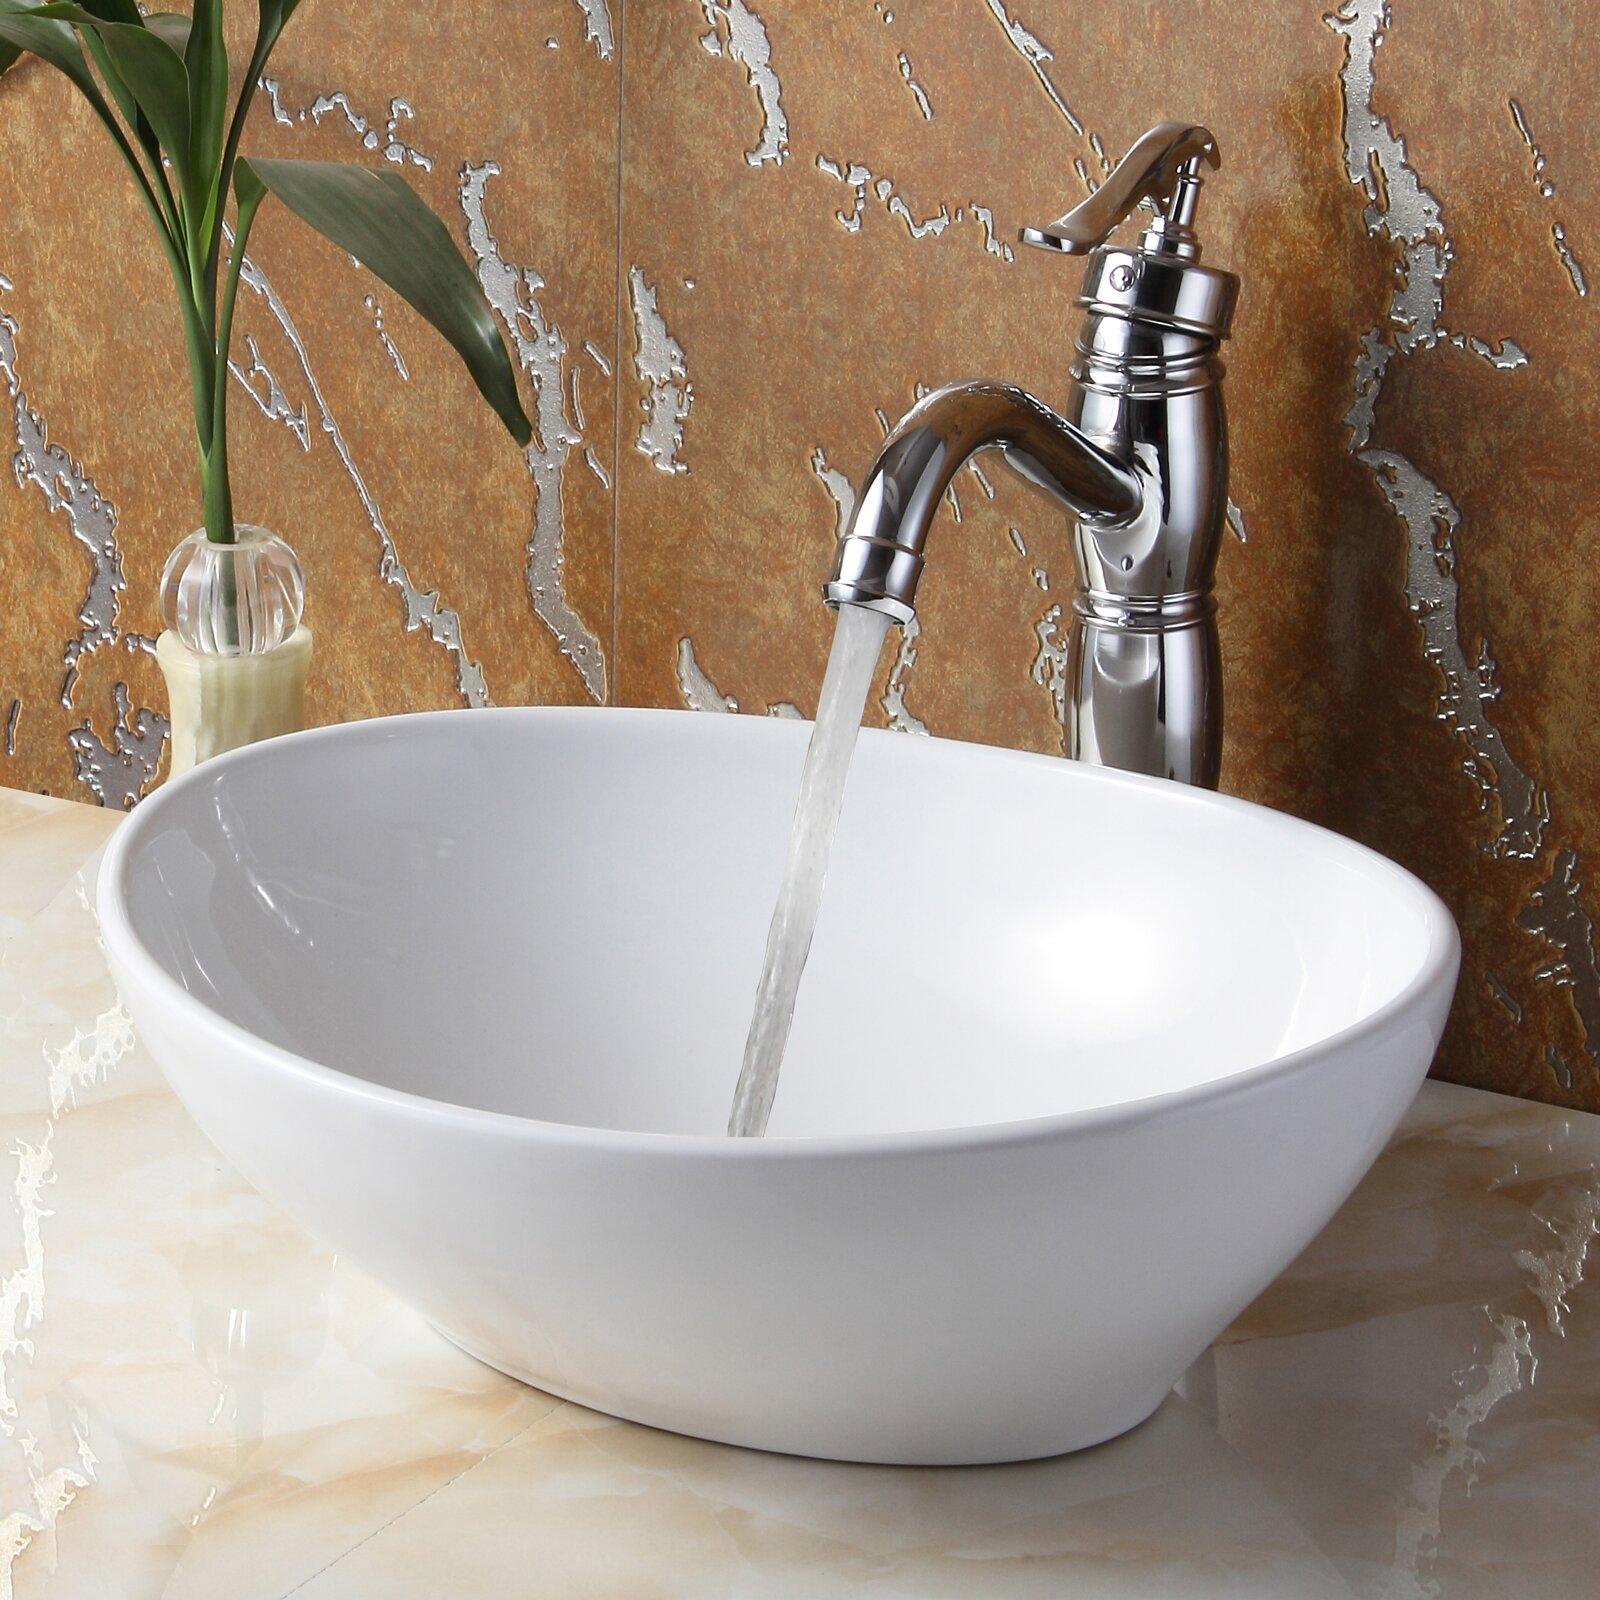 Elite Ceramic Boat-Shaped Bathroom Sink & Reviews